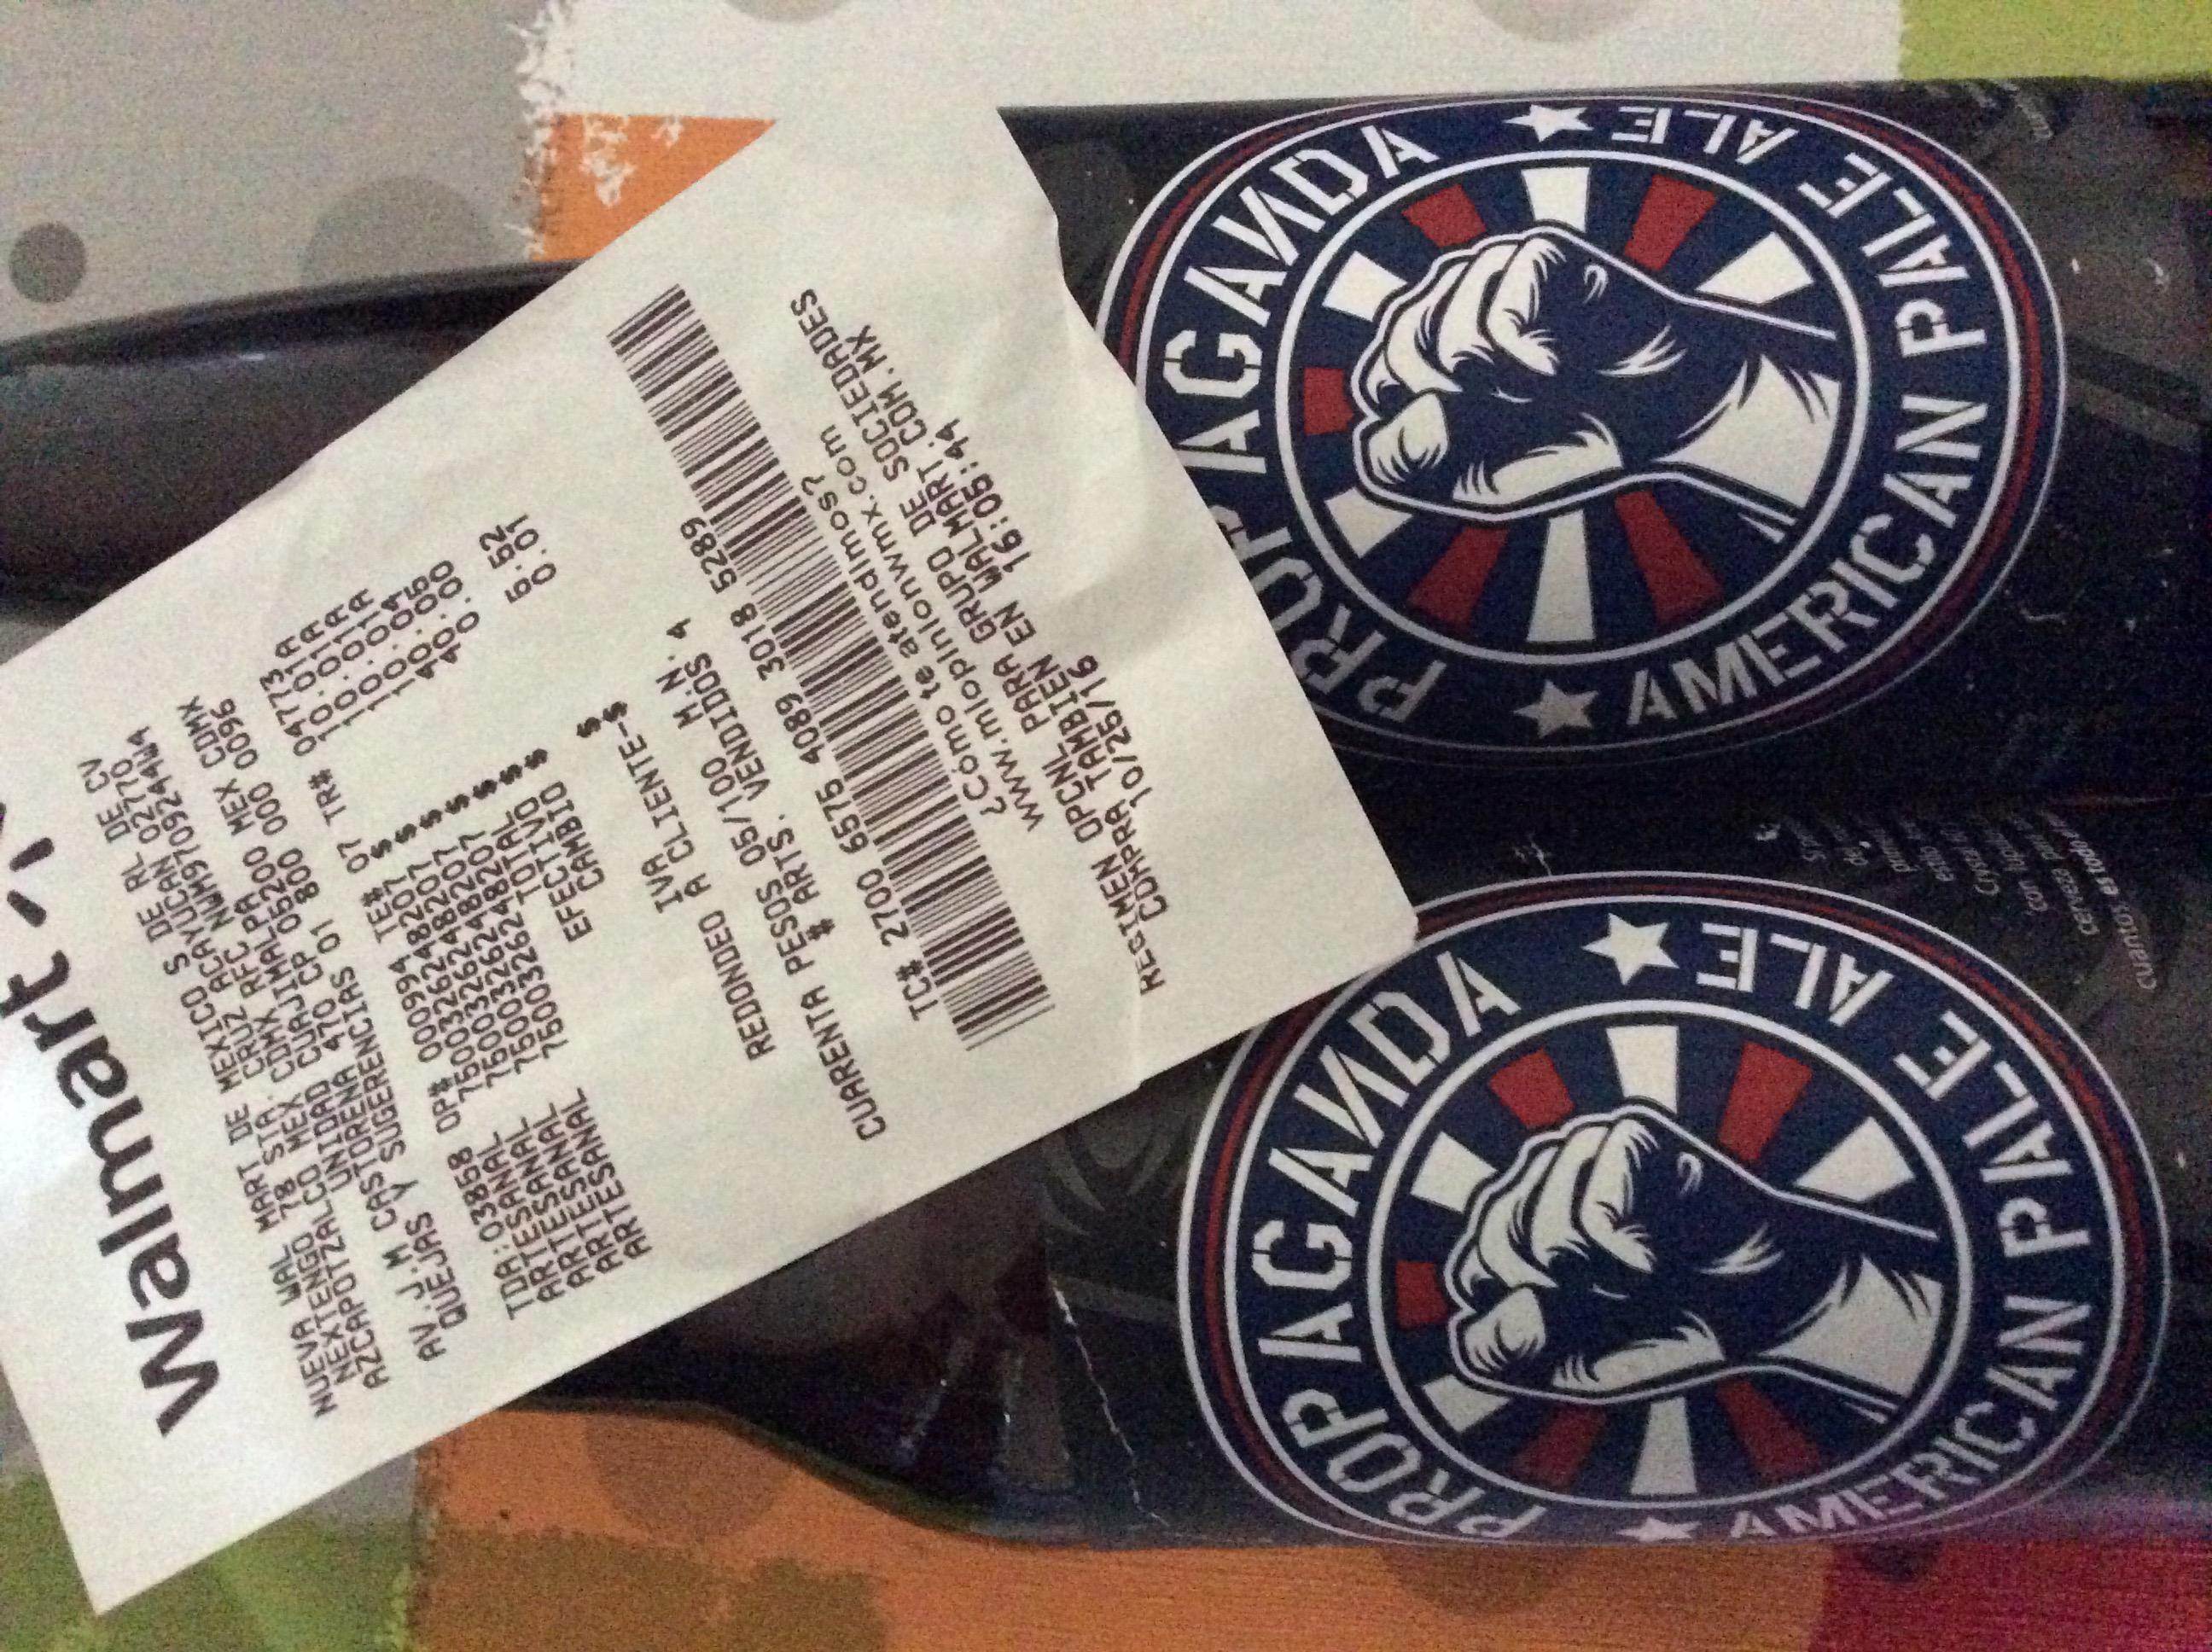 Walmart Cuajimalpa: Cerveza Artesanal Propaganda American Pale Ale a $10.01